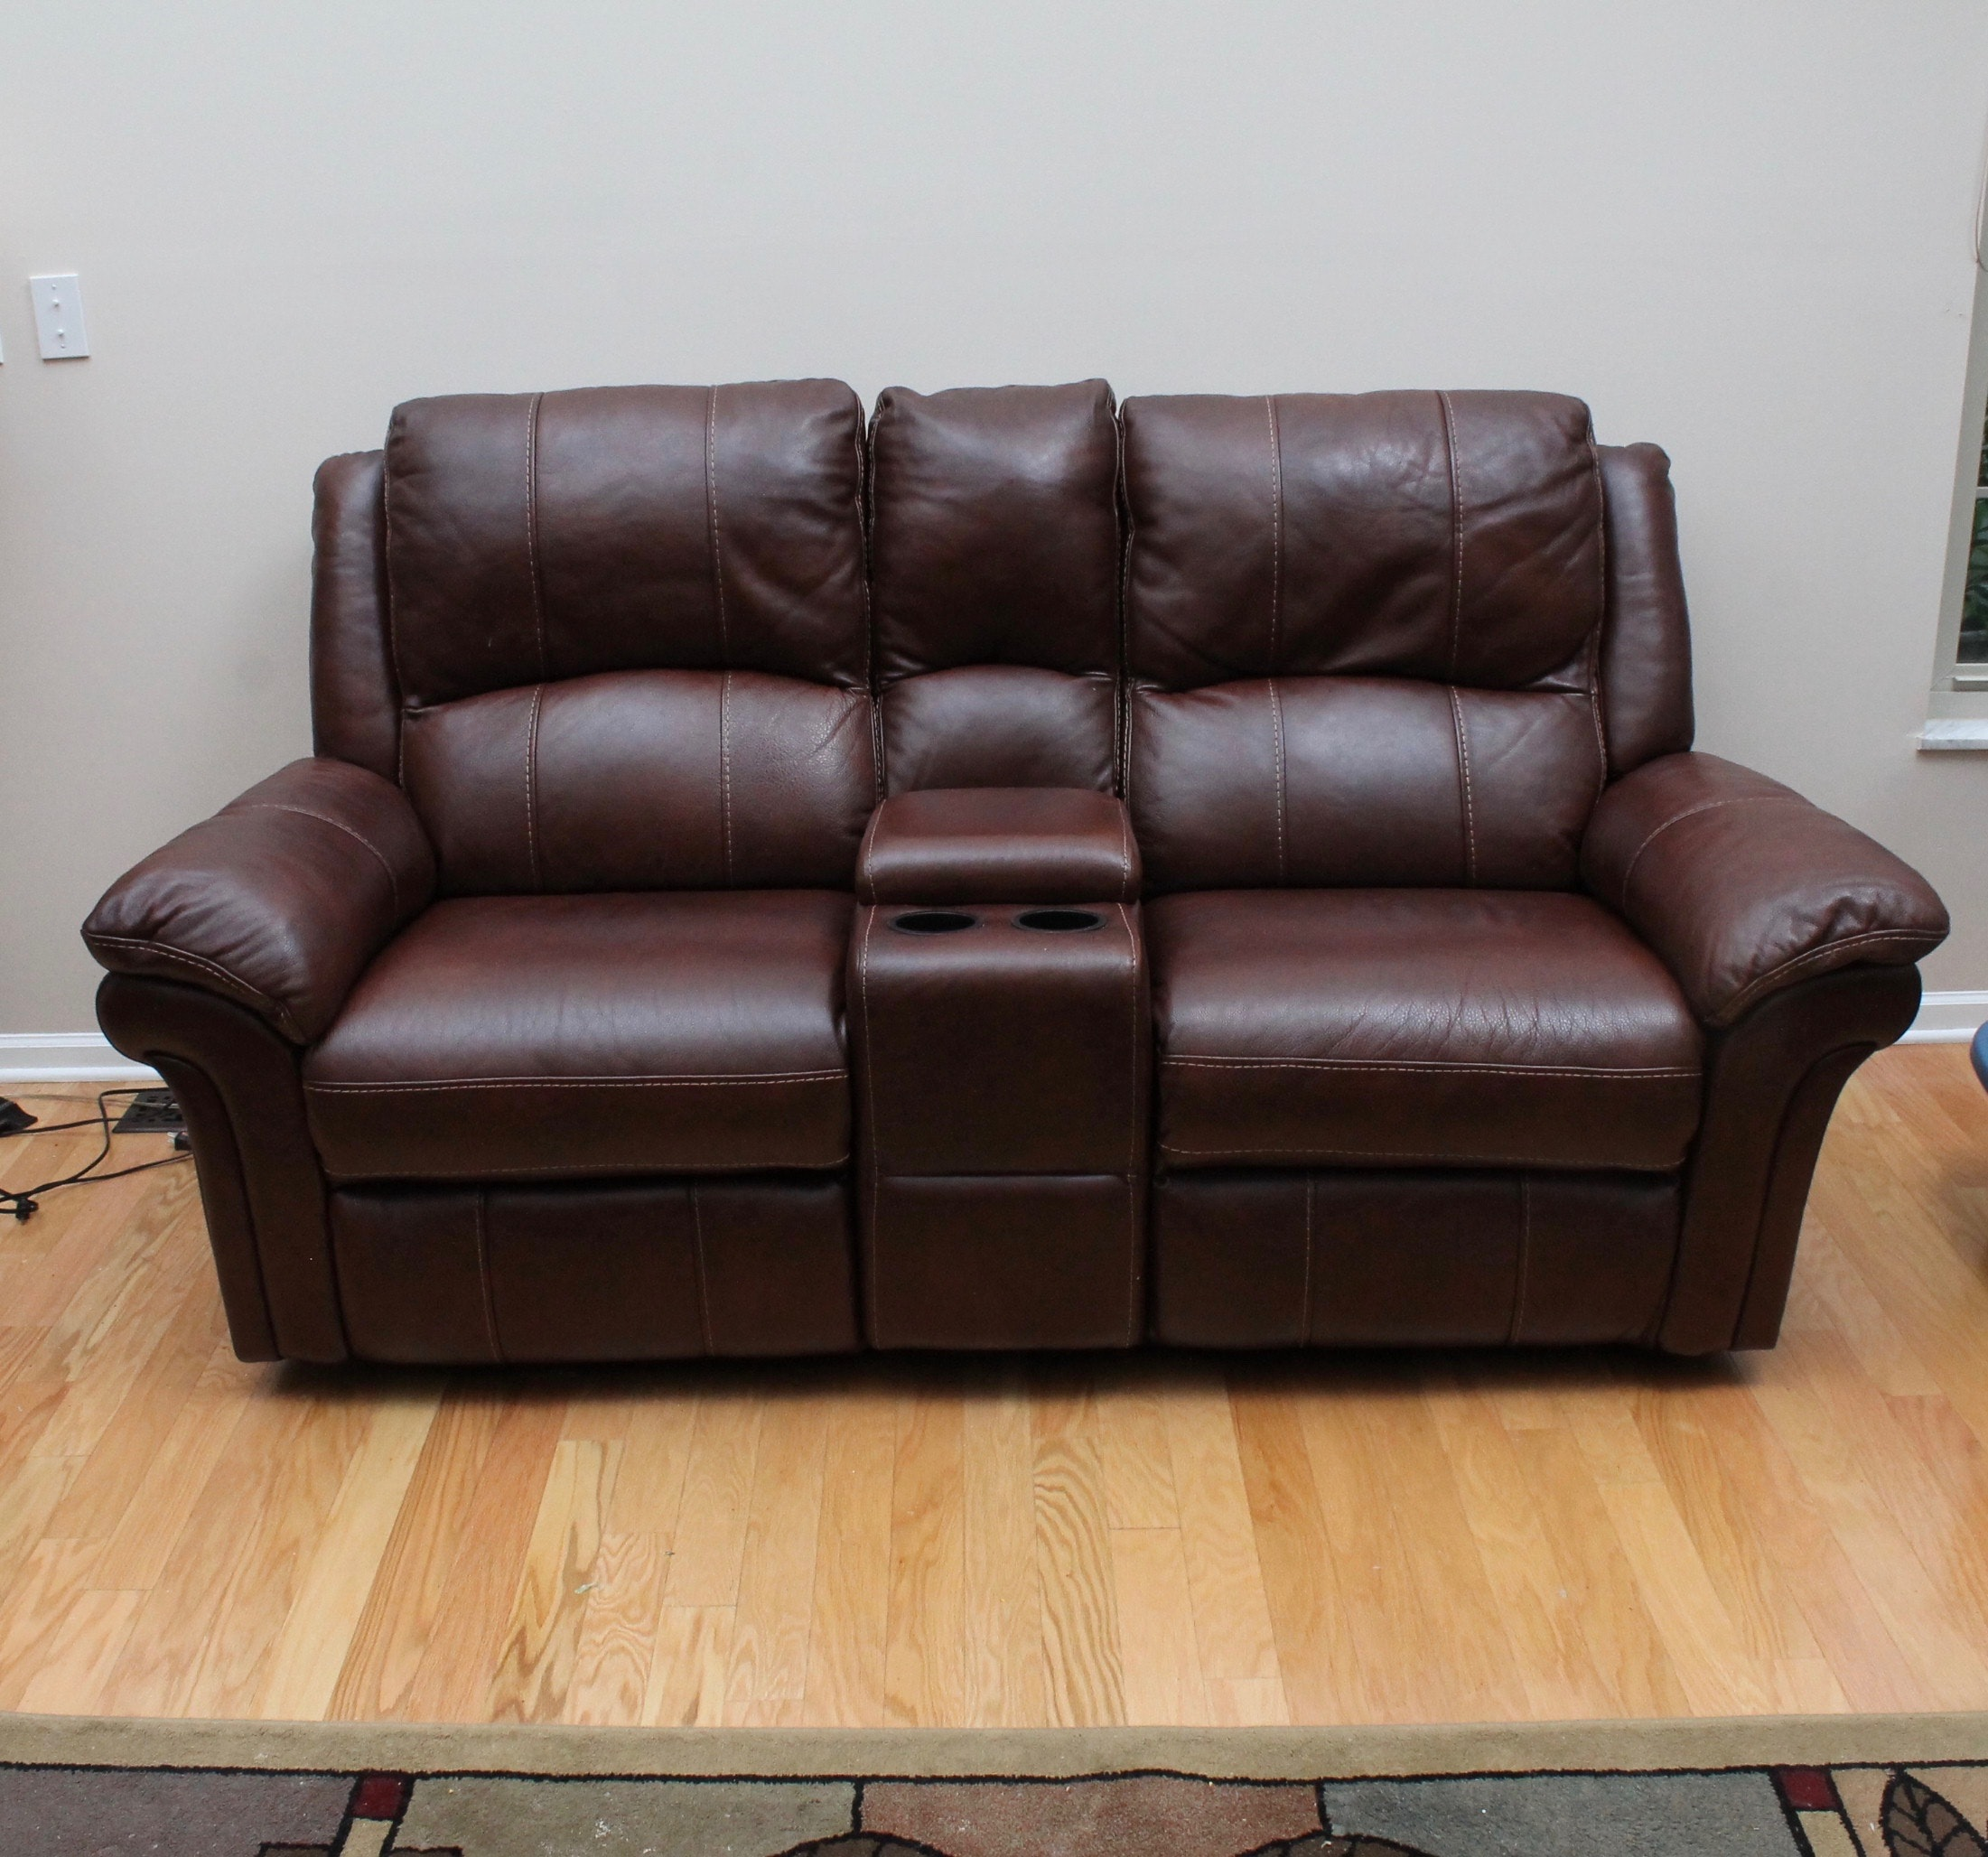 Flexsteel Motorized Reclining Brown Leather Sofa